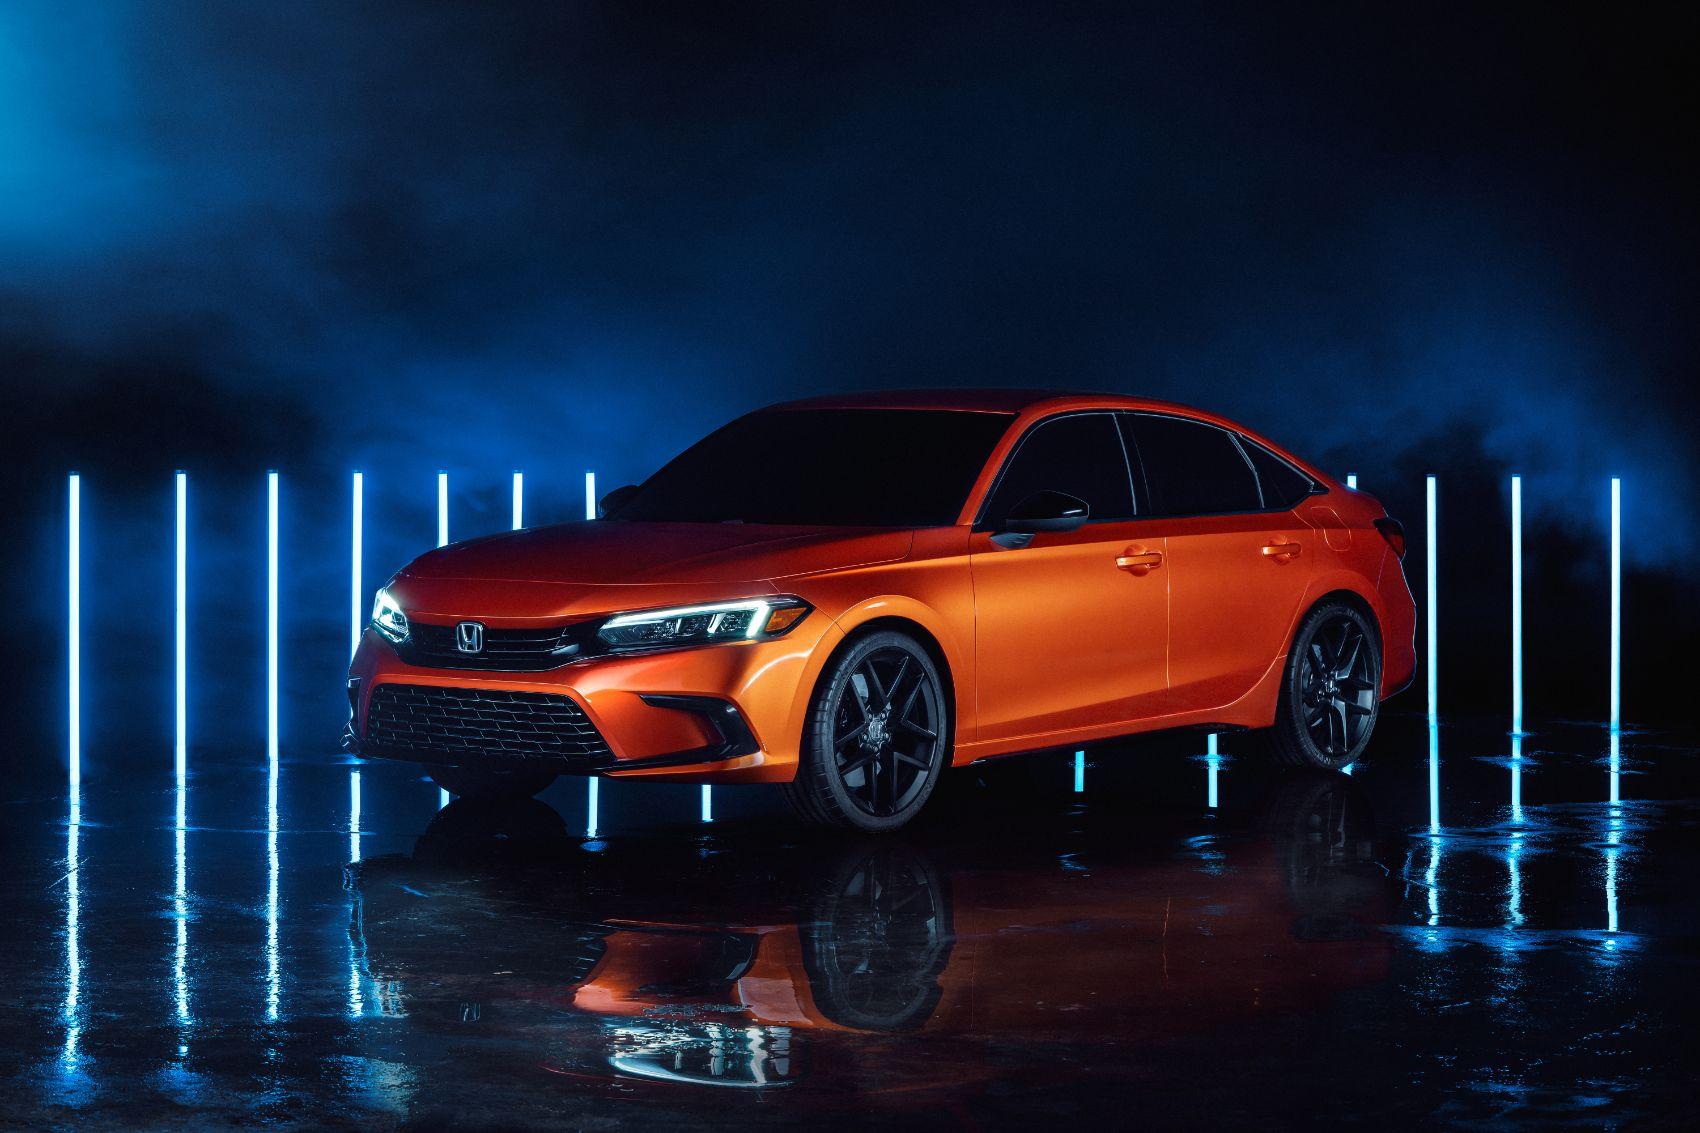 2022 Honda Civic Prototype 1